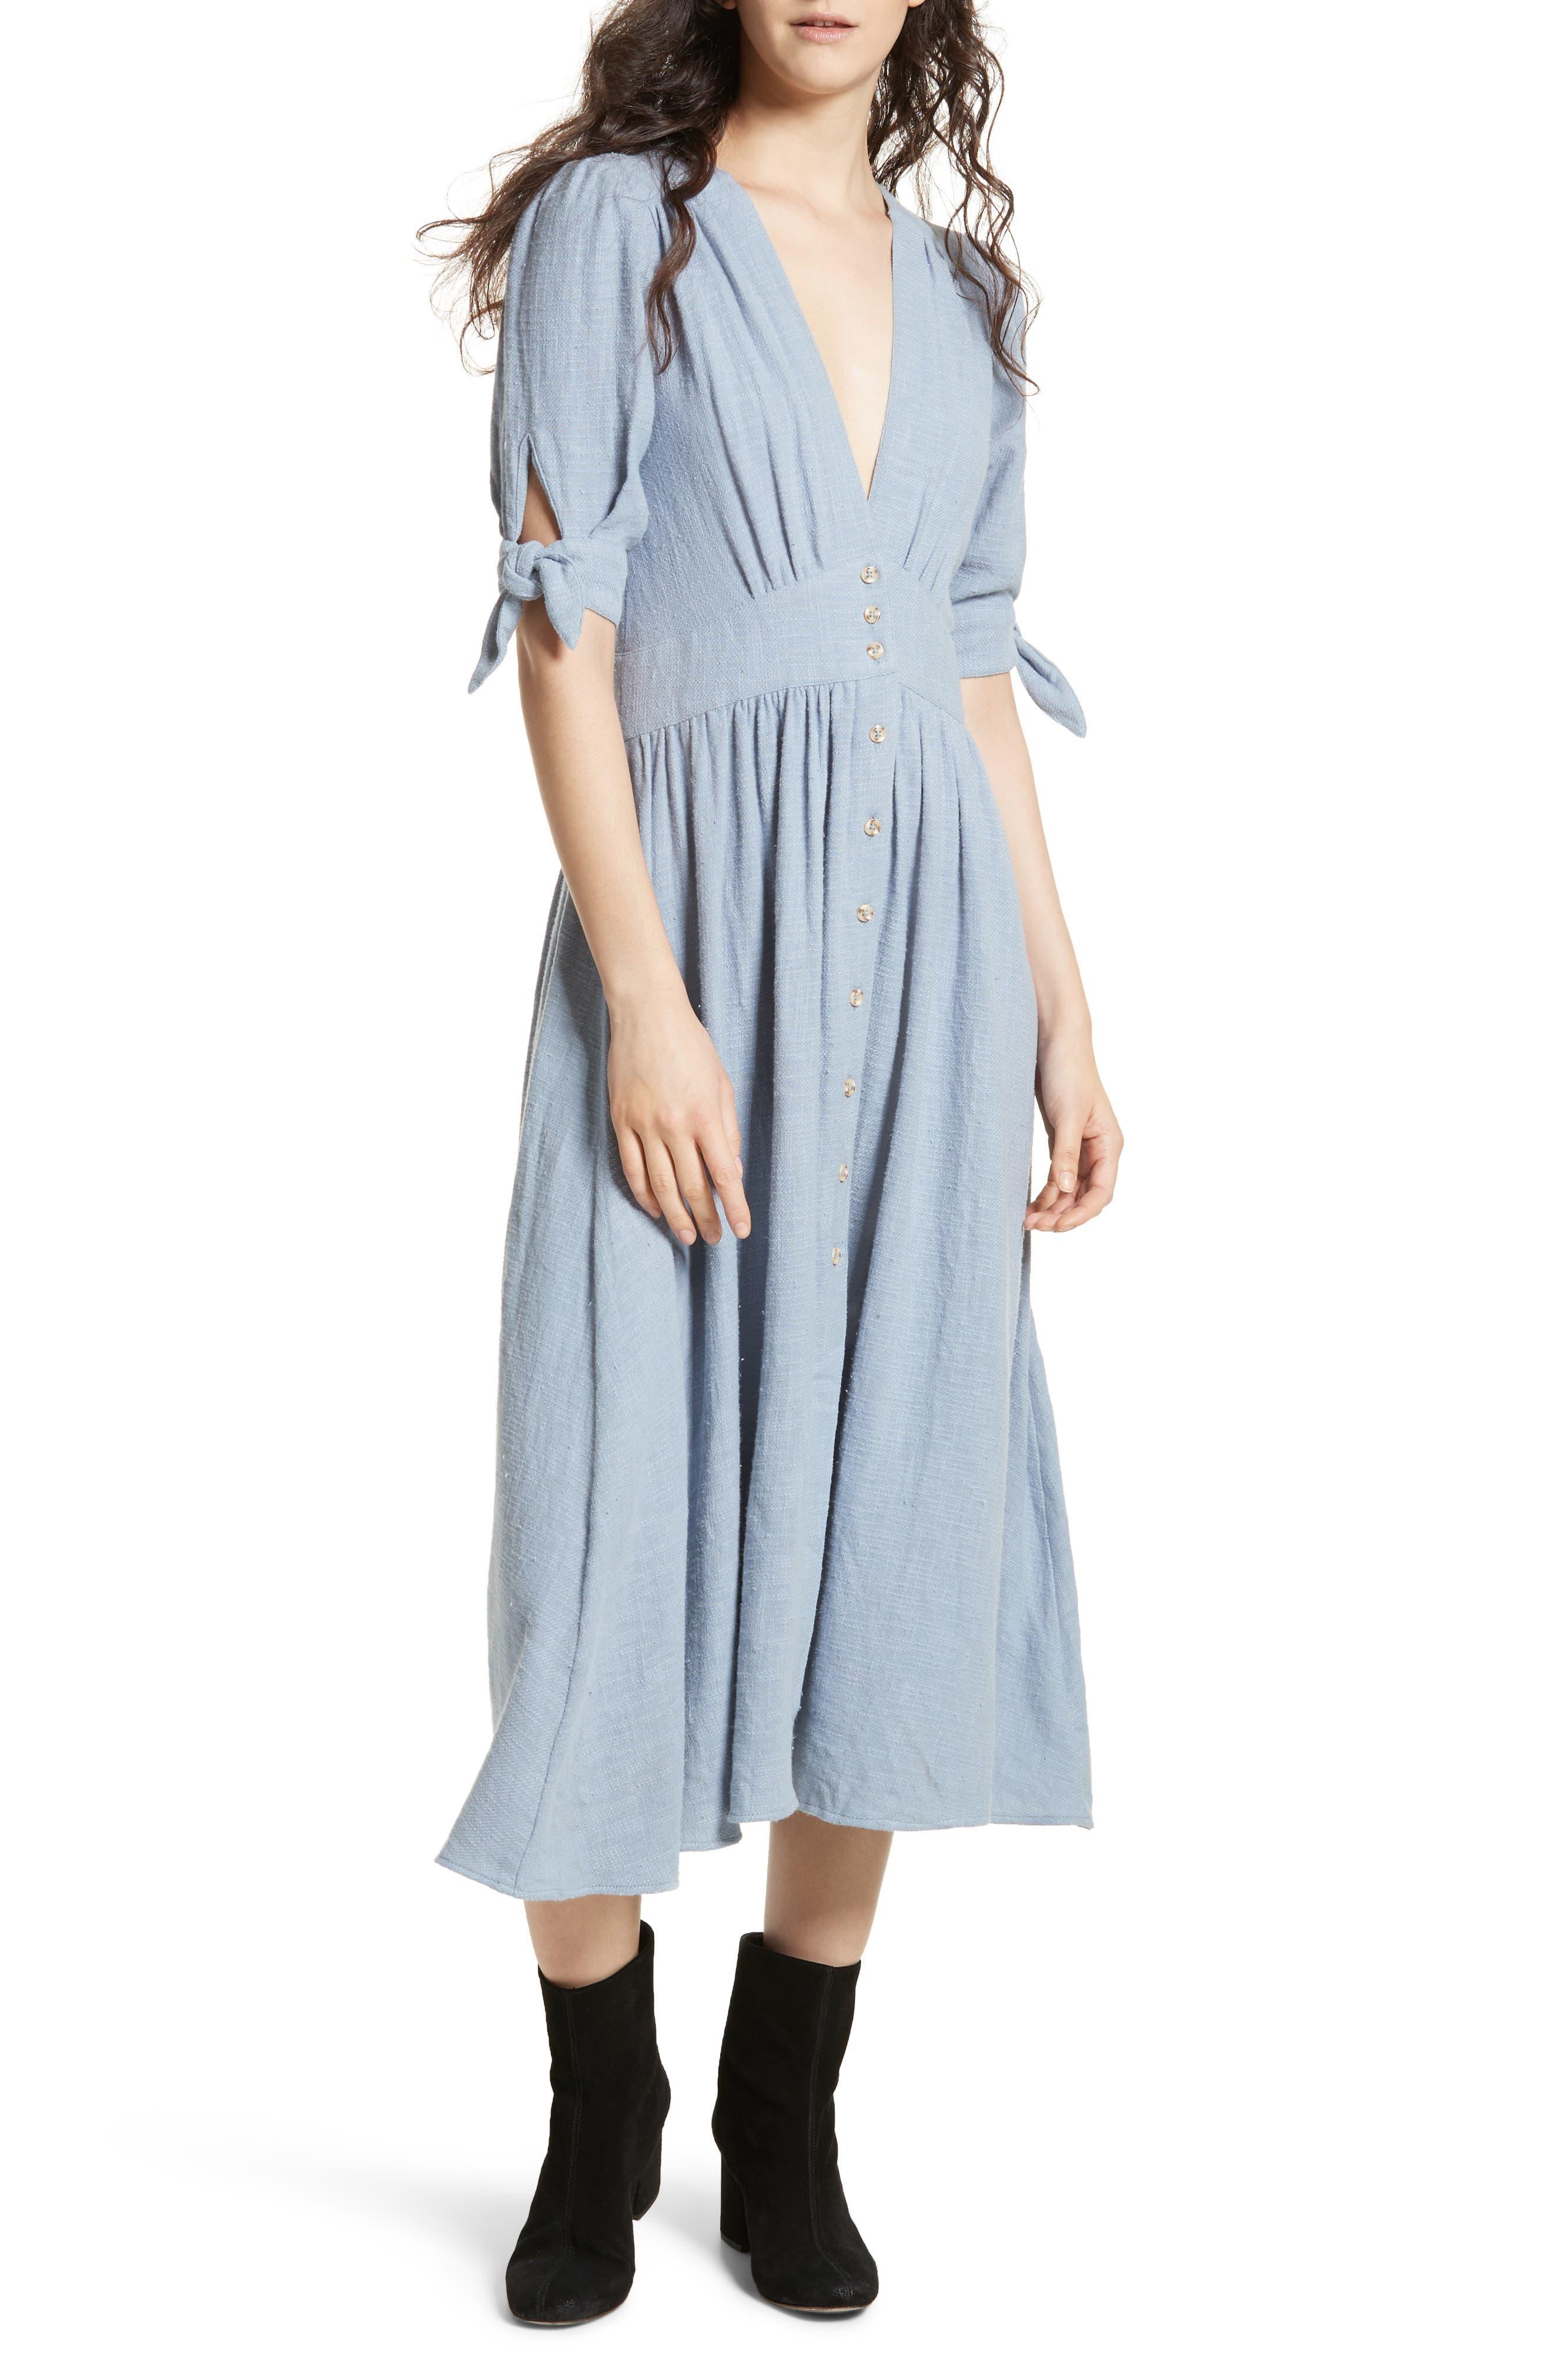 Love of My Life Midi Dress,                         Main,                         color, BLUE